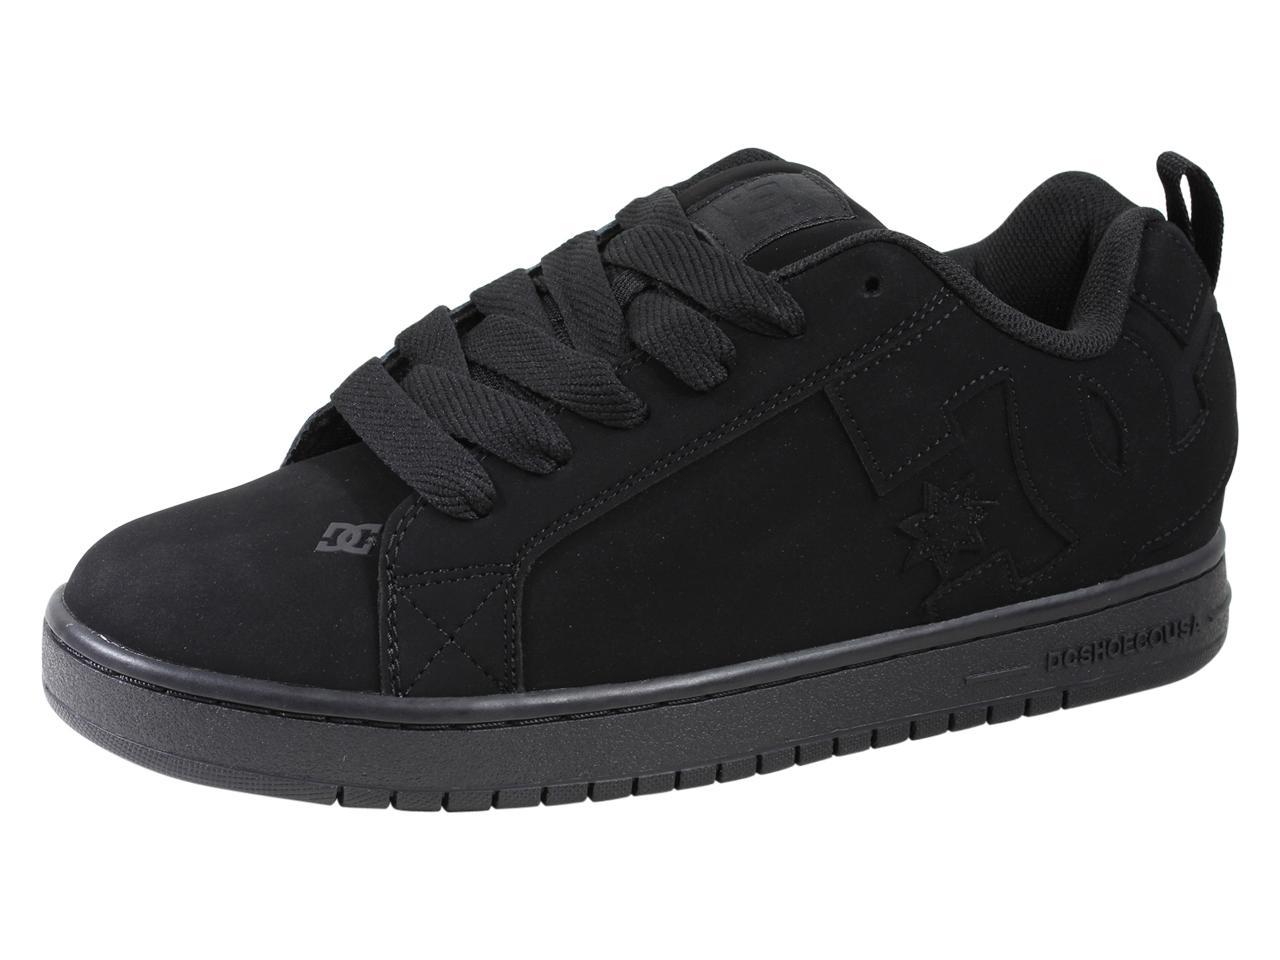 Image of DC Men's Court Graffik Skateboarding Sneakers Shoes - Black/Black/Black Leather - 9 D(M) US